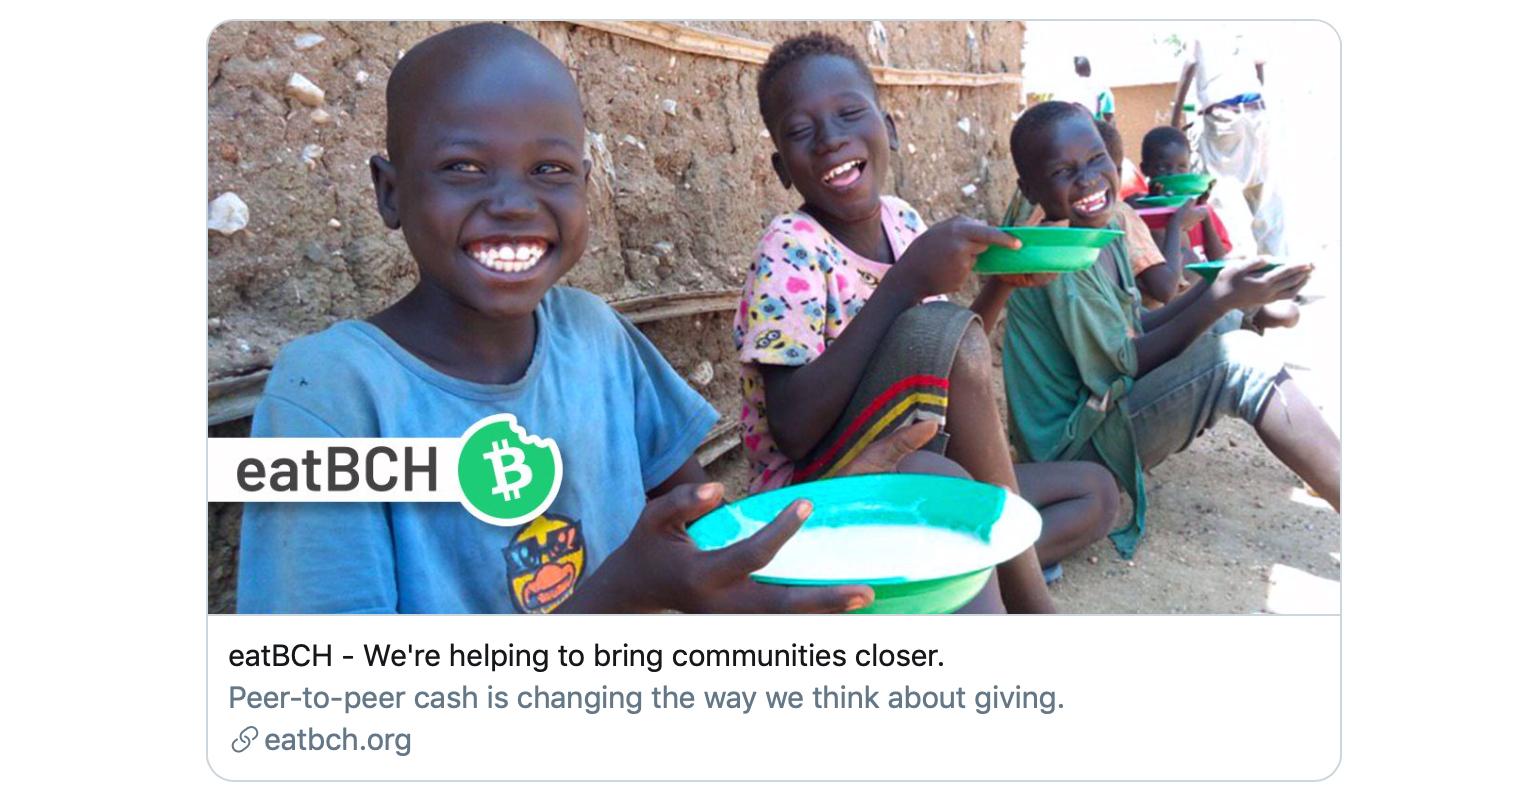 "Bitcoin Cash Community Funds Viaje de Eatbch a Ghana ""width ="" 1520 ""height ="" 800 ""srcset ="" https://blackswanfinances.com/wp-content/uploads/2019/11/ssudan.jpg 1520w, https: //news.bitcoin.com/wp-content/uploads/2019/11/ssudan-300x158.jpg 300w, https://news.bitcoin.com/wp-content/uploads/2019/11/ssudan-1024x539.jpg 1024w, https://news.bitcoin.com/wp-content/uploads/2019/11/ssudan-768x404.jpg 768w, https://news.bitcoin.com/wp-content/uploads/2019/11/ssudan -696x366.jpg 696w, https://news.bitcoin.com/wp-content/uploads/2019/11/ssudan-1392x733.jpg 1392w, https://news.bitcoin.com/wp-content/uploads/2019 /11/ssudan-1068x562.jpg 1068w, https://news.bitcoin.com/wp-content/uploads/2019/11/ssudan-798x420.jpg 798w ""tamaños ="" (ancho máximo: 1520px) 100vw, 1520px"